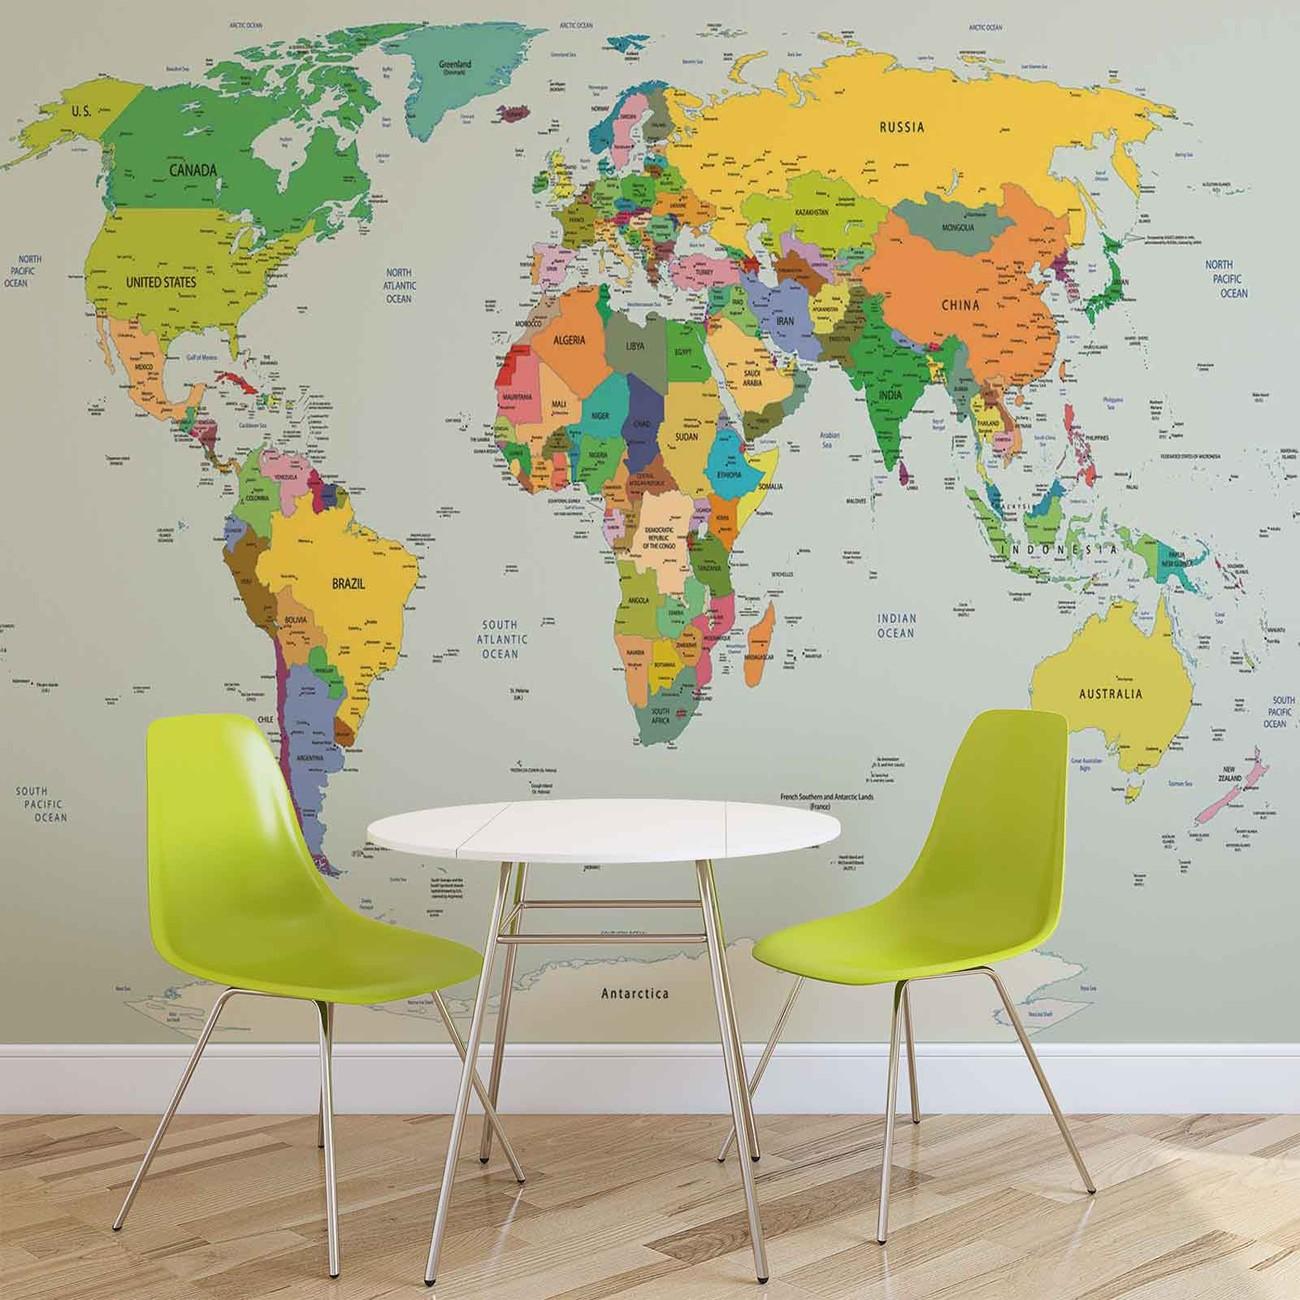 brazil karta sveta Mapa světa fototapeta, tapeta na zeď na Posters.cz brazil karta sveta